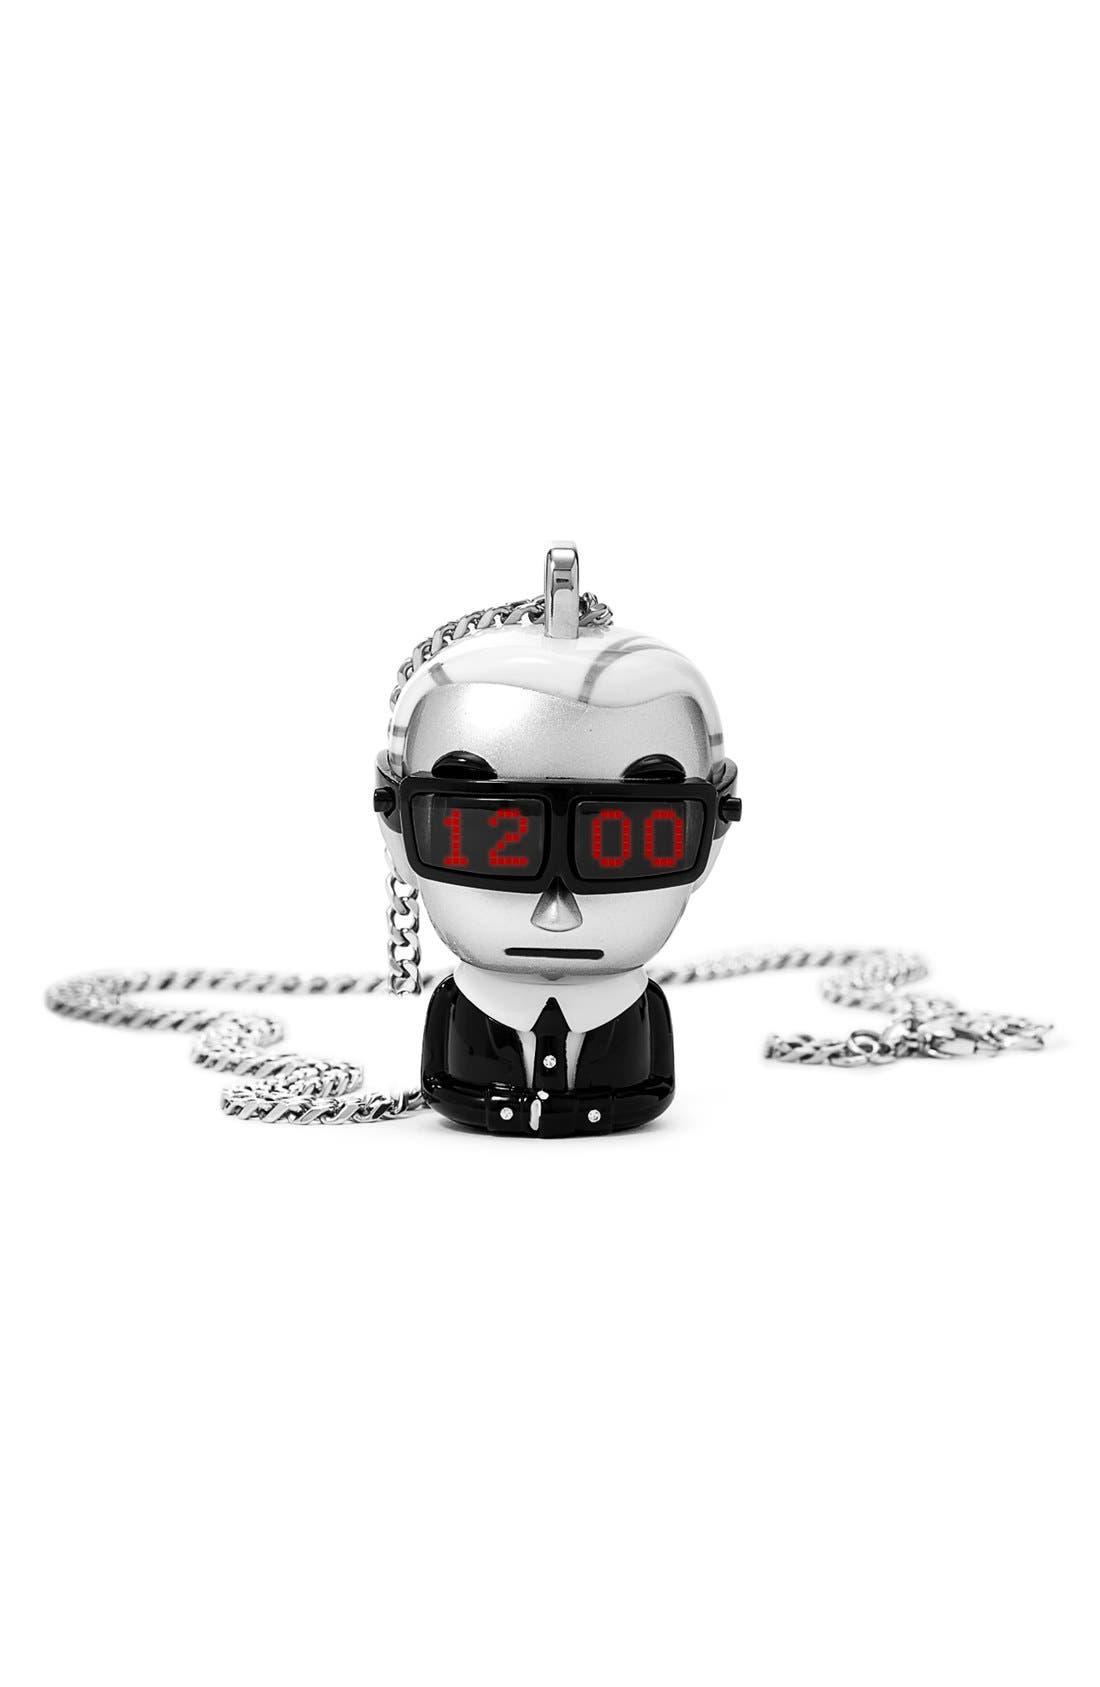 KARL LAGERFELD 'tokidoki' Digital Necklace Watch, 37mm x 51mm,                             Alternate thumbnail 4, color,                             040